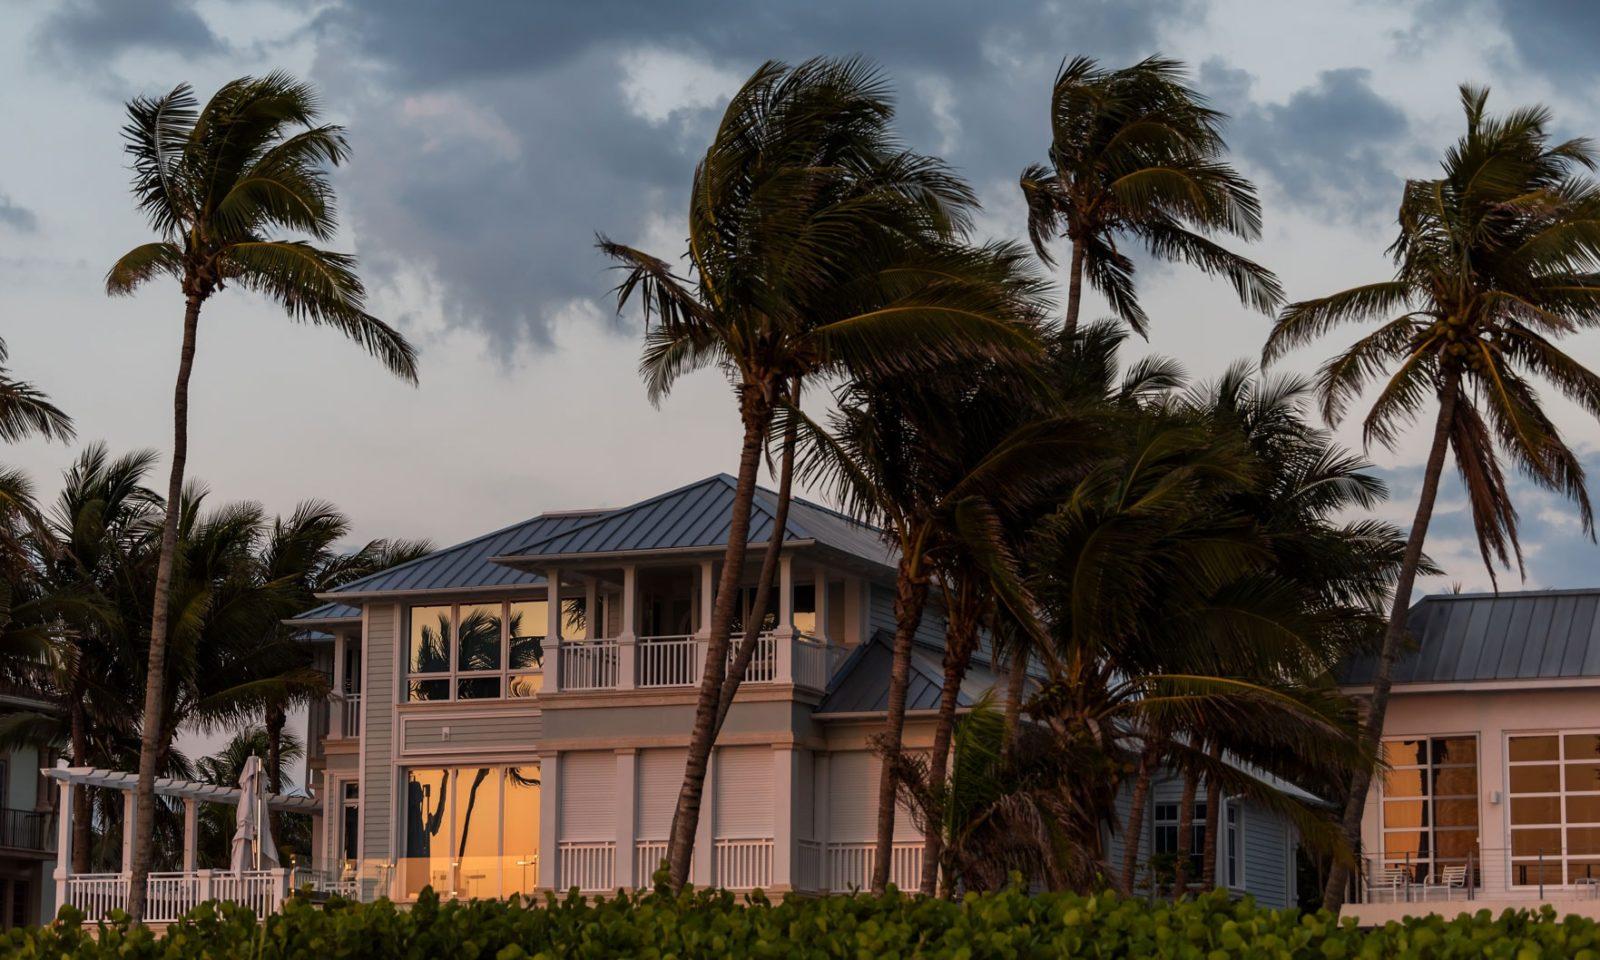 Hurricane Sally: 13 Counties Under State of Emergency Order